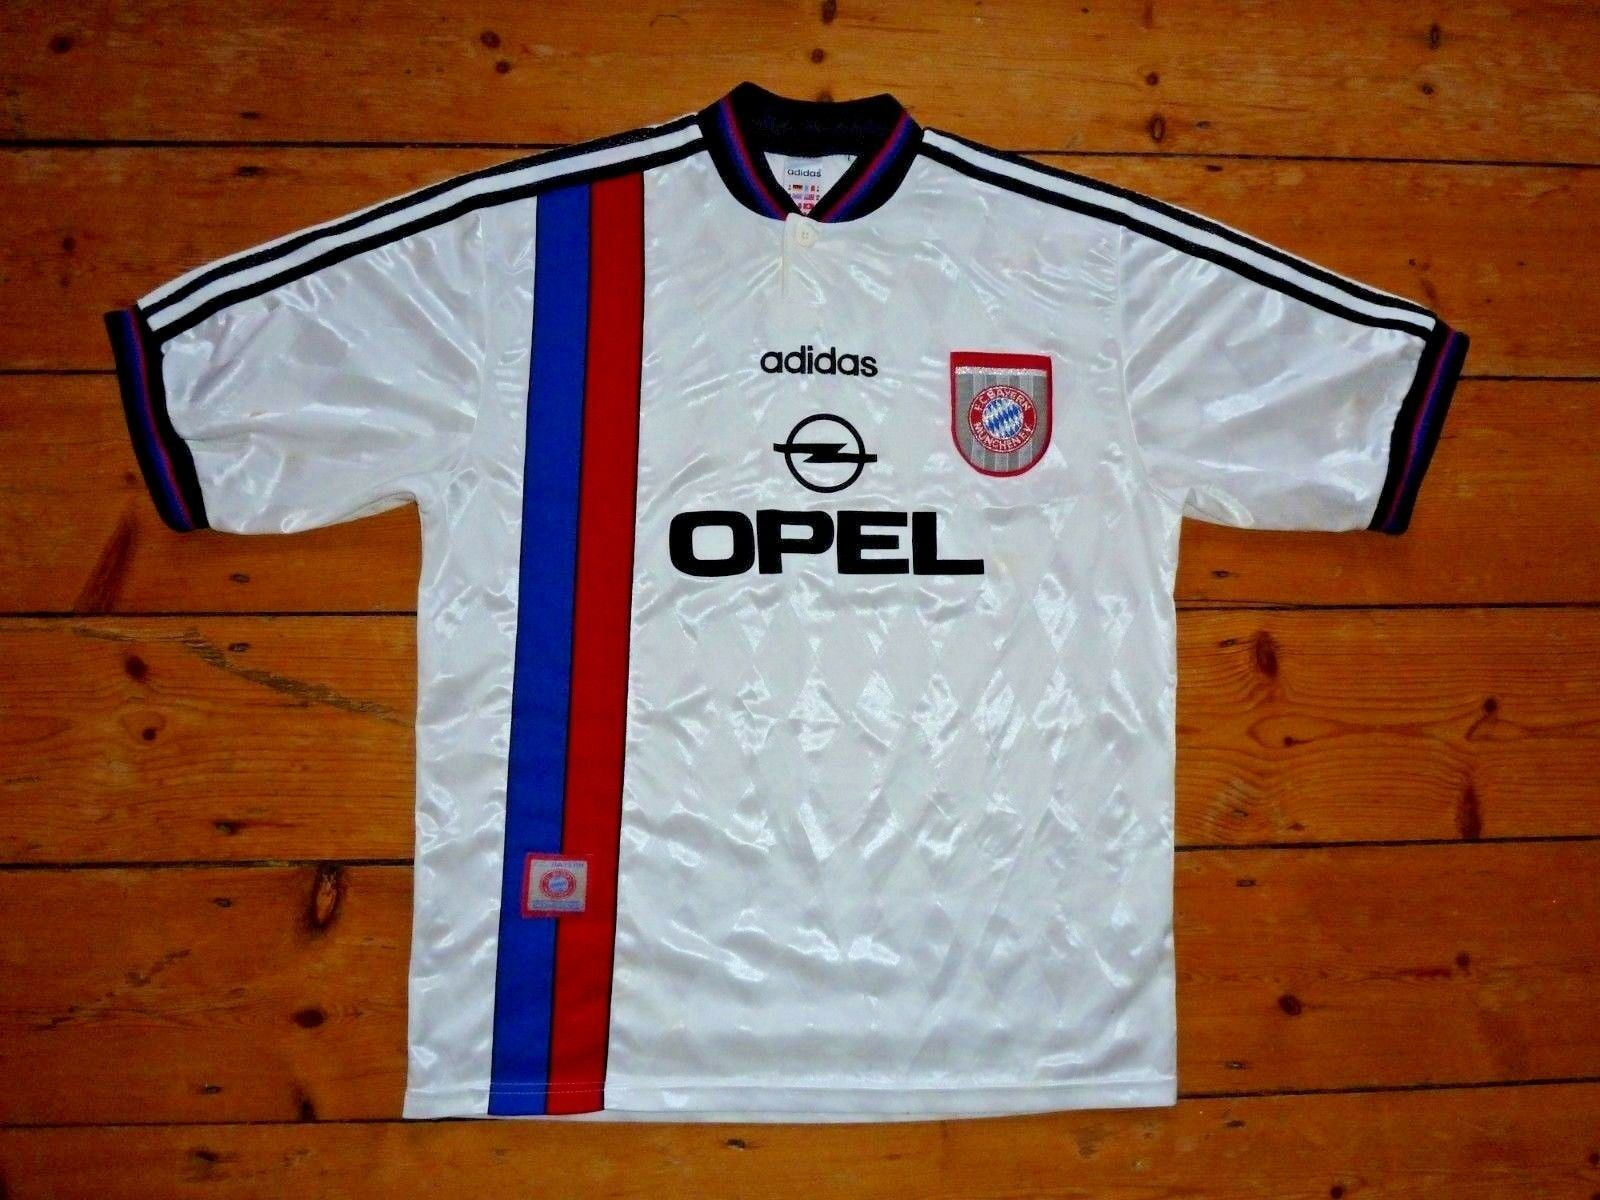 Bayern Monaco Calcio in Jersey grandi via 1995 SOCCER JERSEY MUNCHEN M